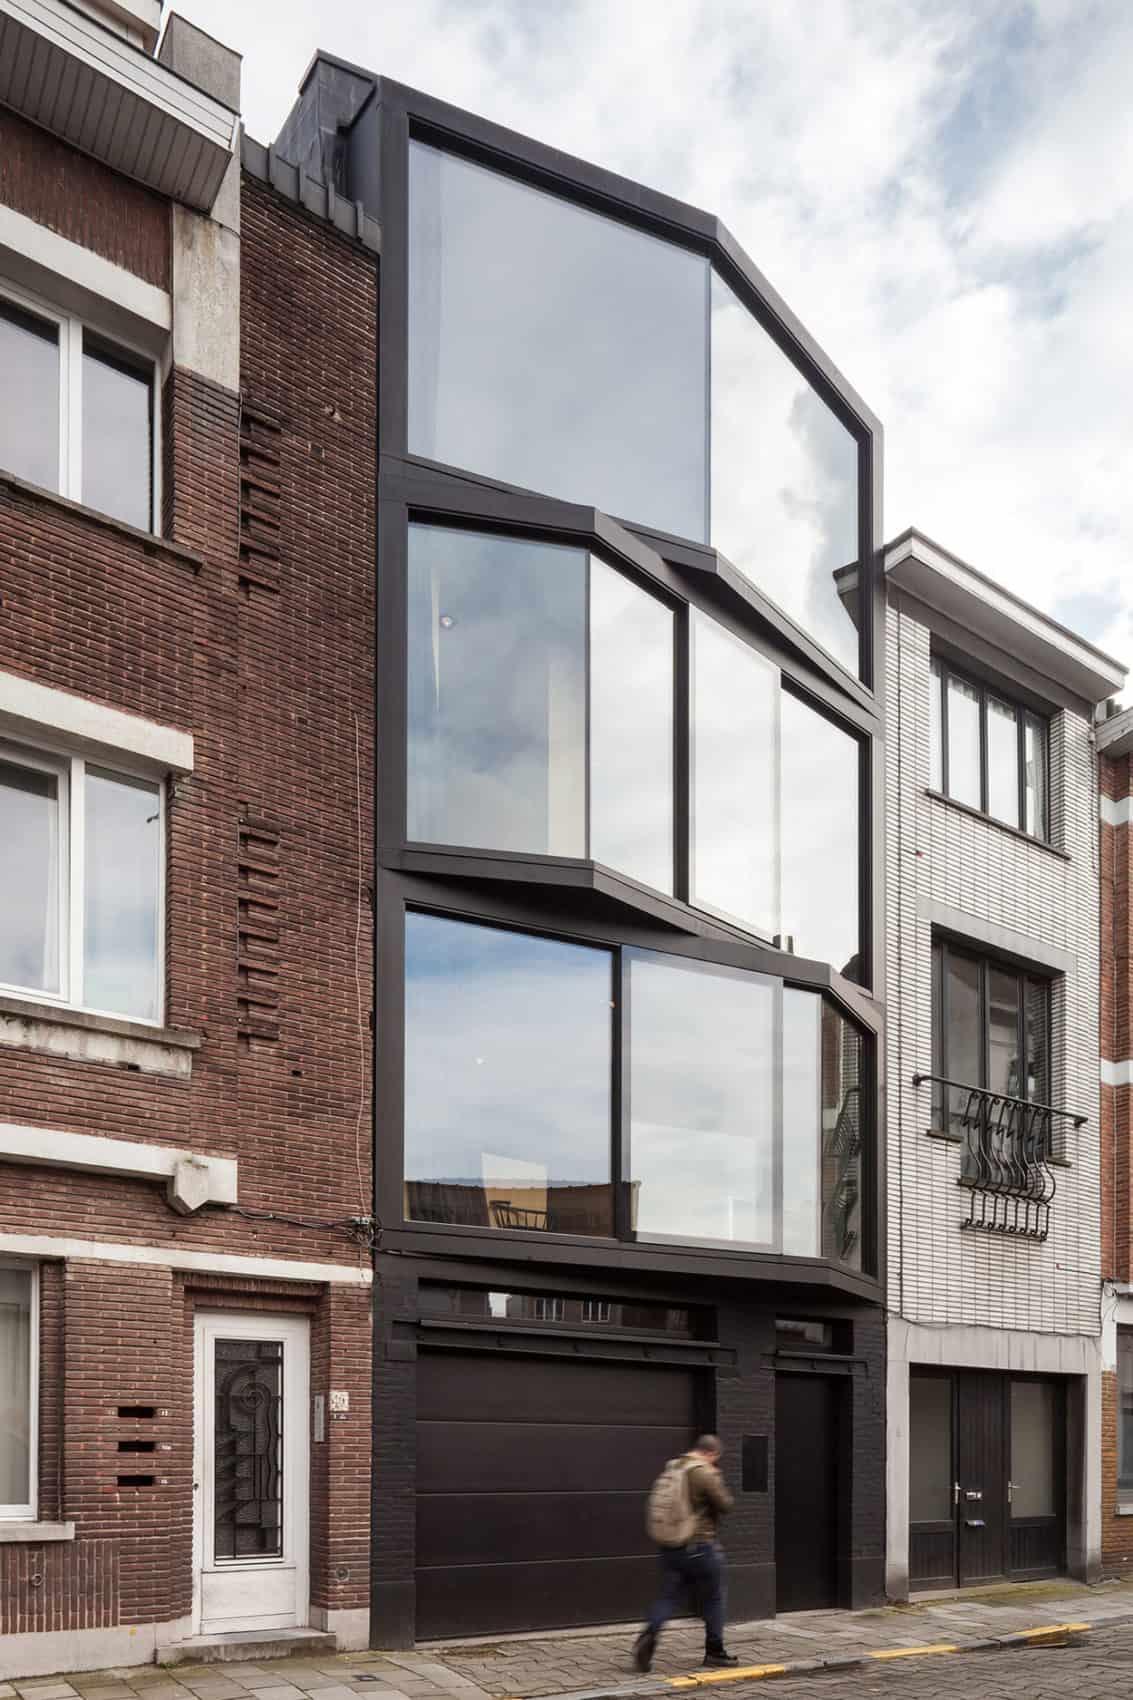 Abeel House by Steven Vandenborre (1)